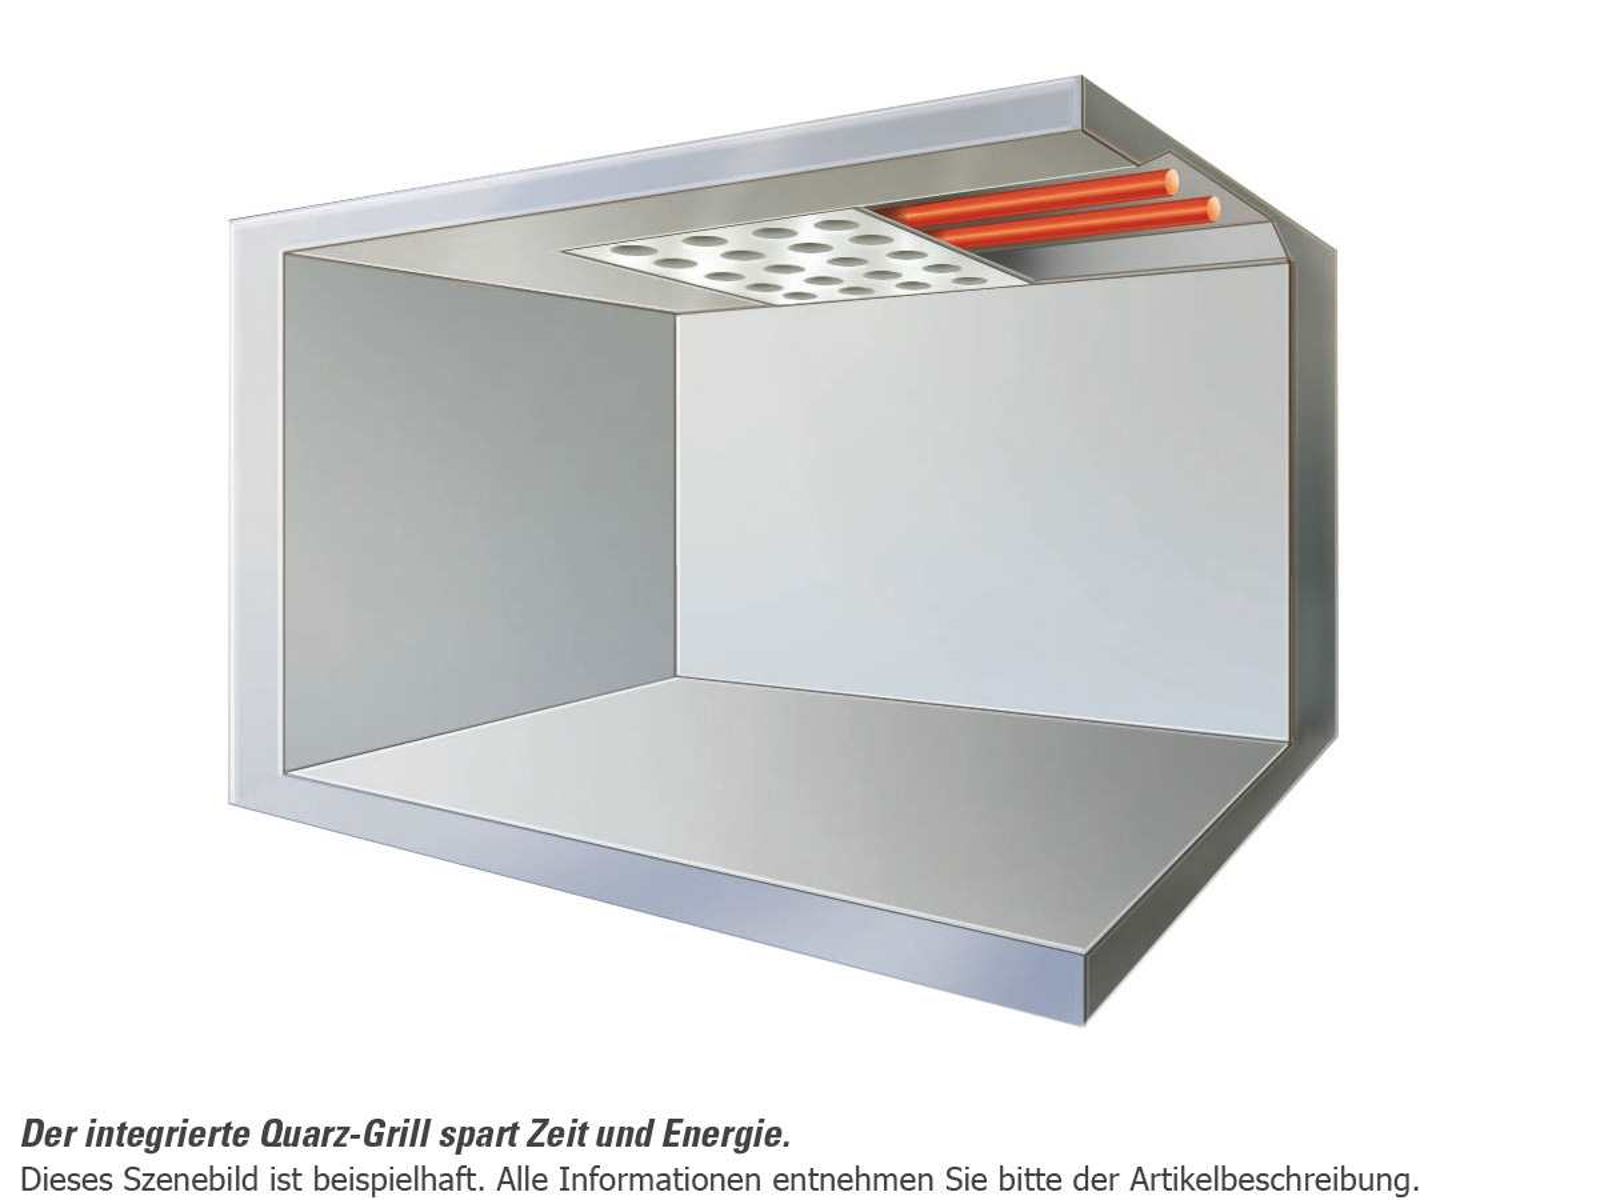 Teka MWS 22 EGR Einbau-Mikrowelle mit Grill Edelstahl